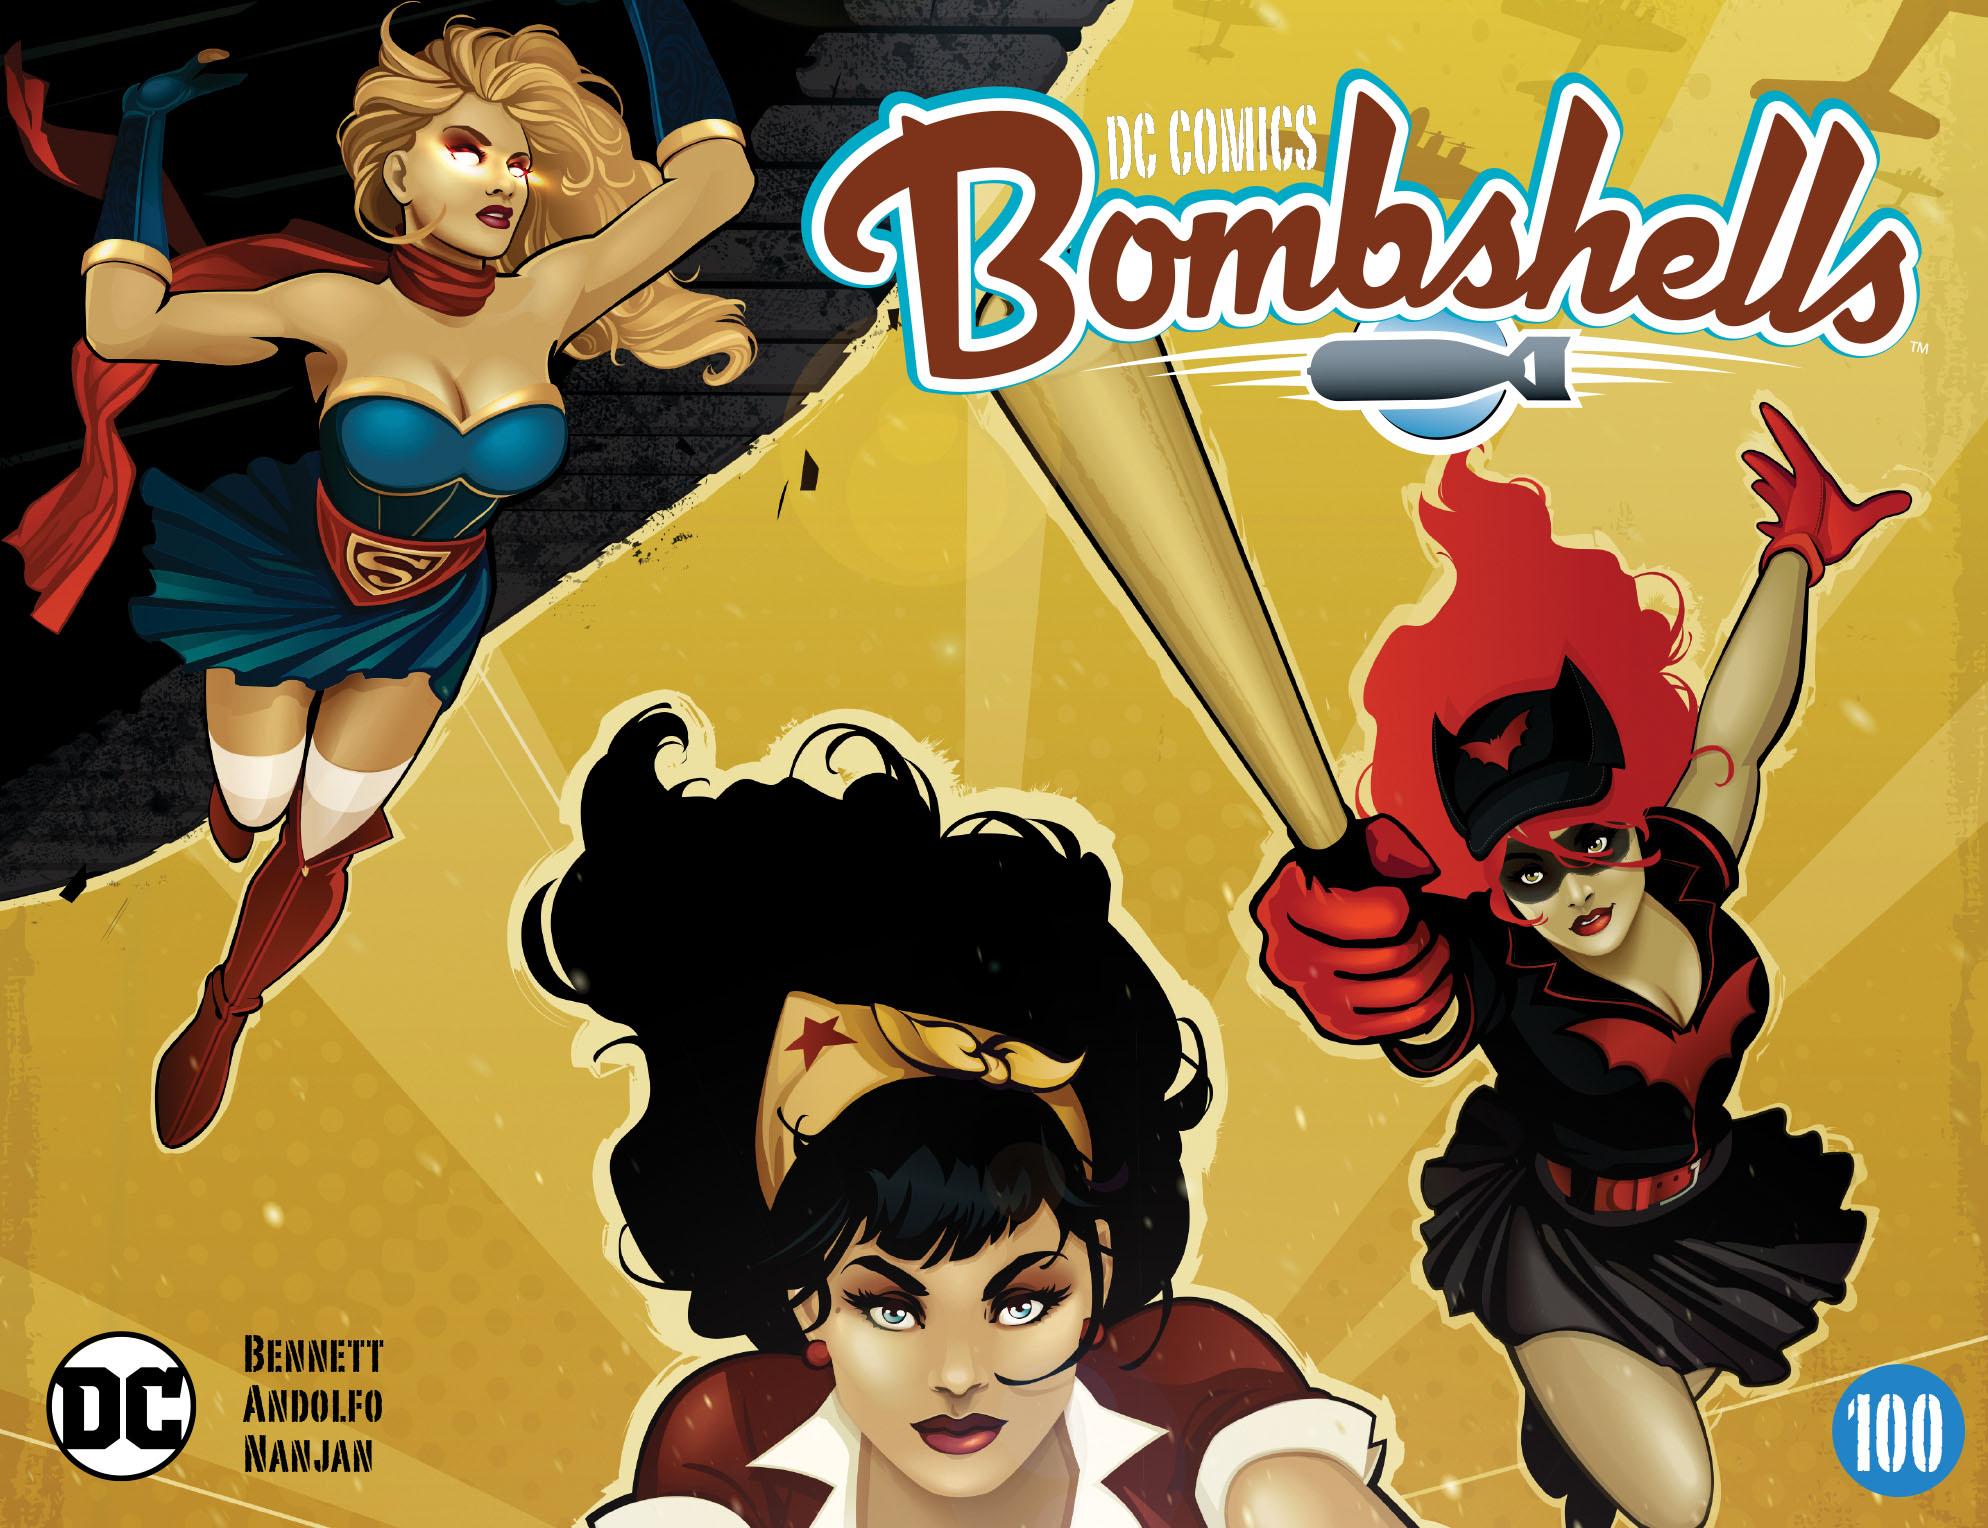 Read online DC Comics: Bombshells comic -  Issue #100 - 1